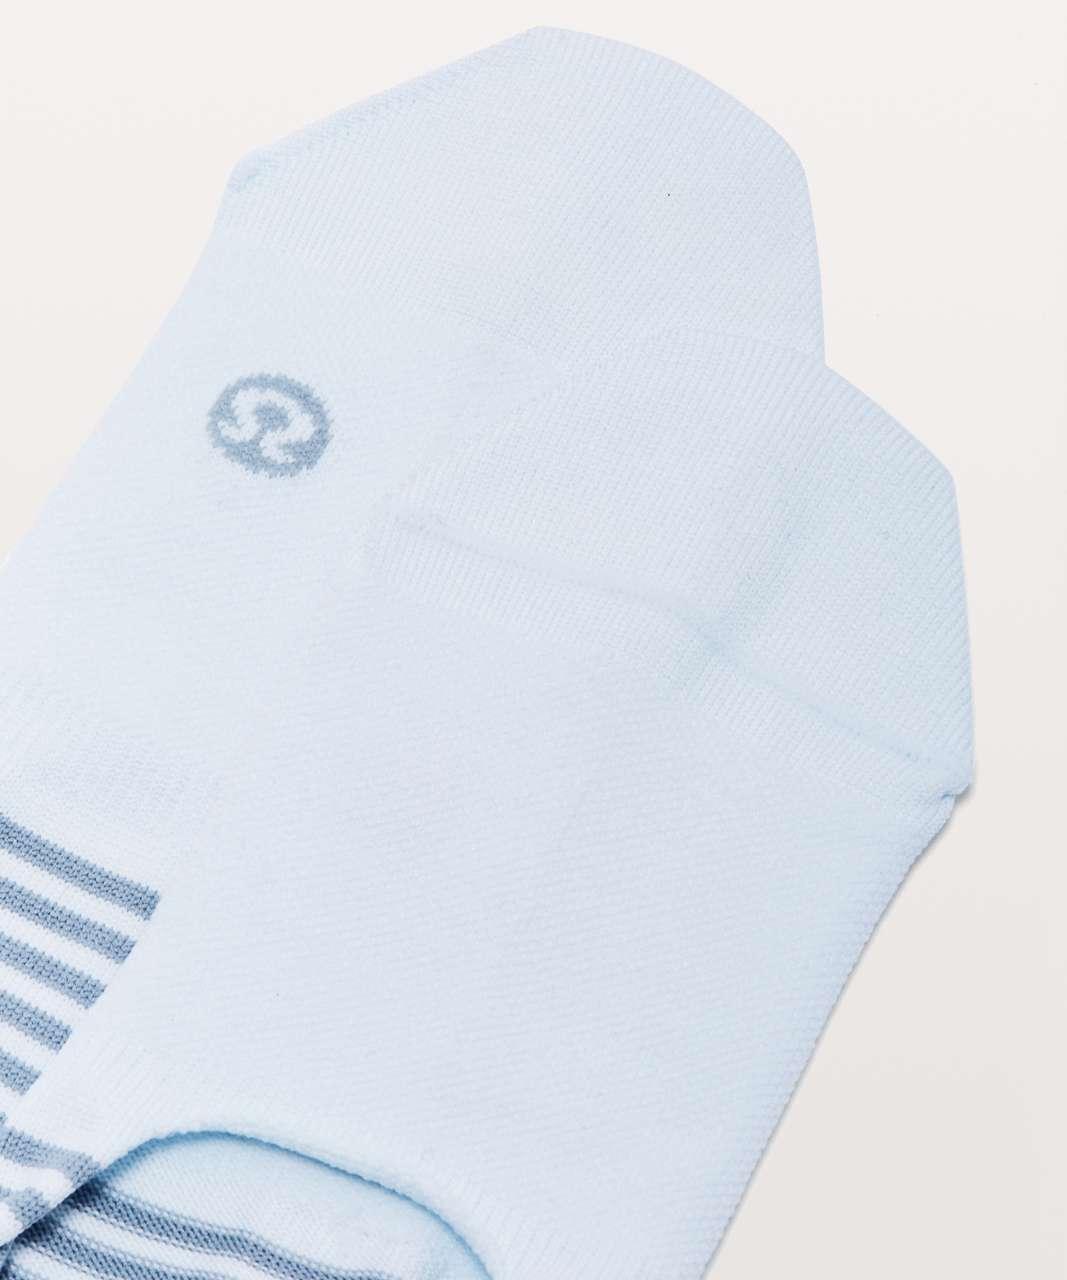 Lululemon Secret Sock - Sheer Blue / Blue Cast